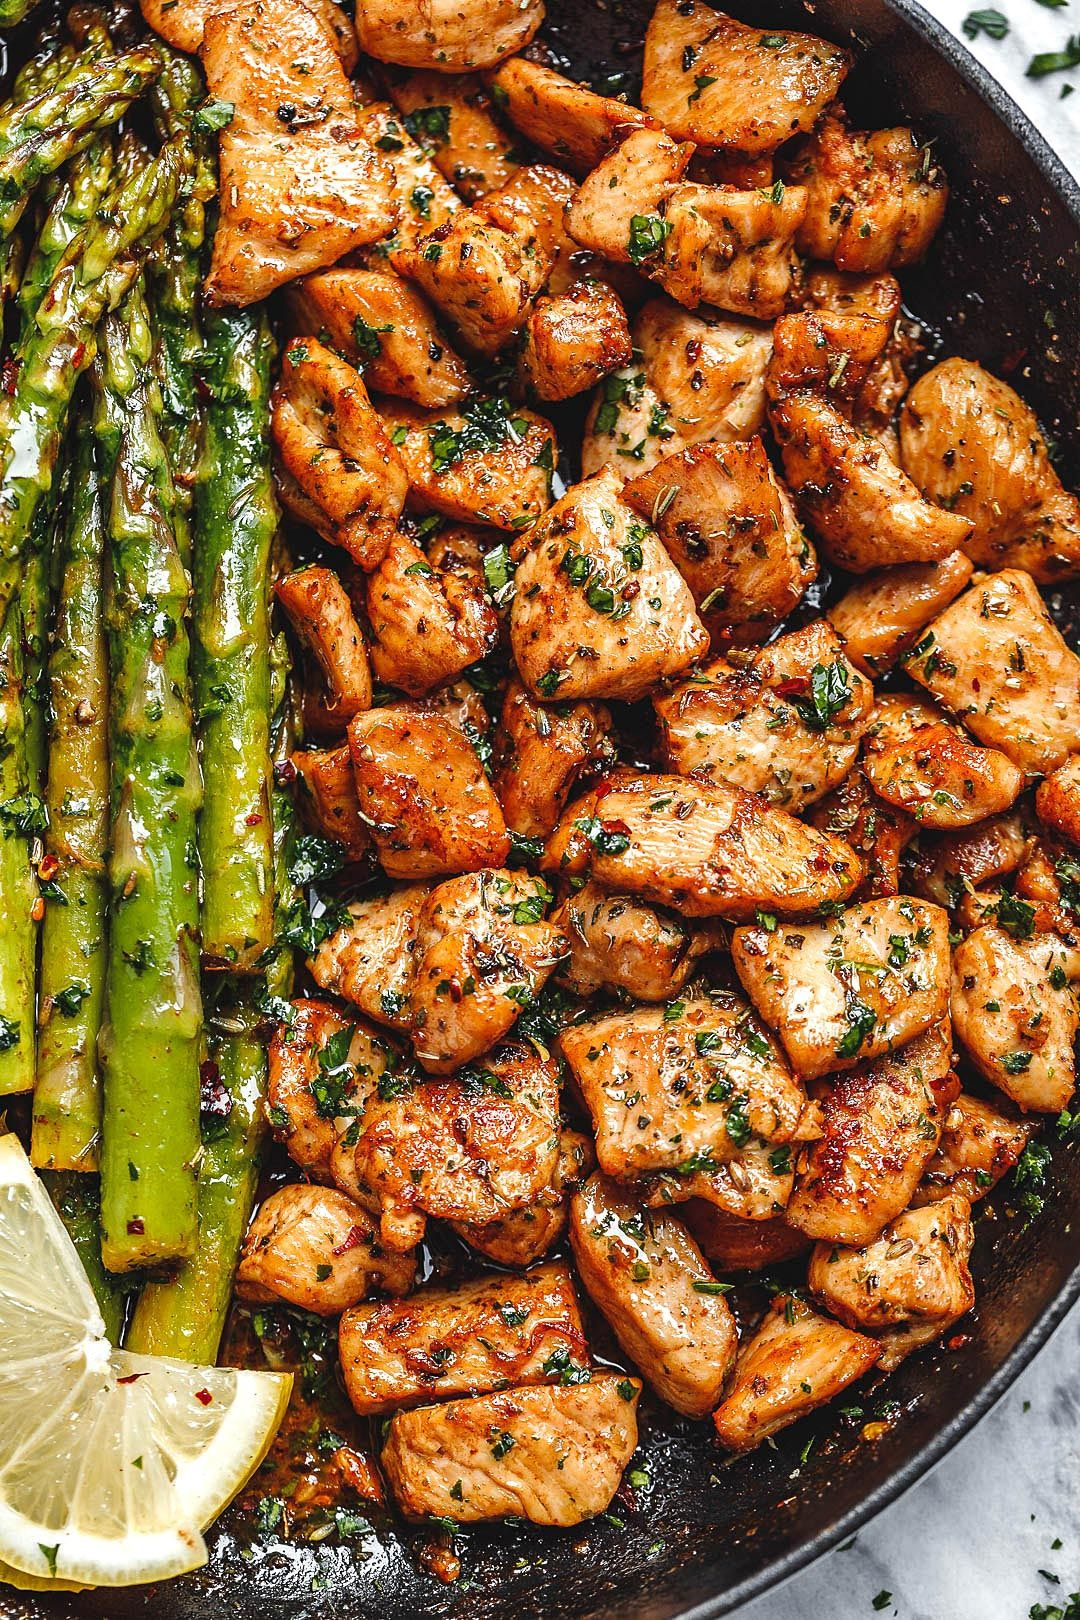 Garlic Butter Chicken Bites and Asparagus Recipe –